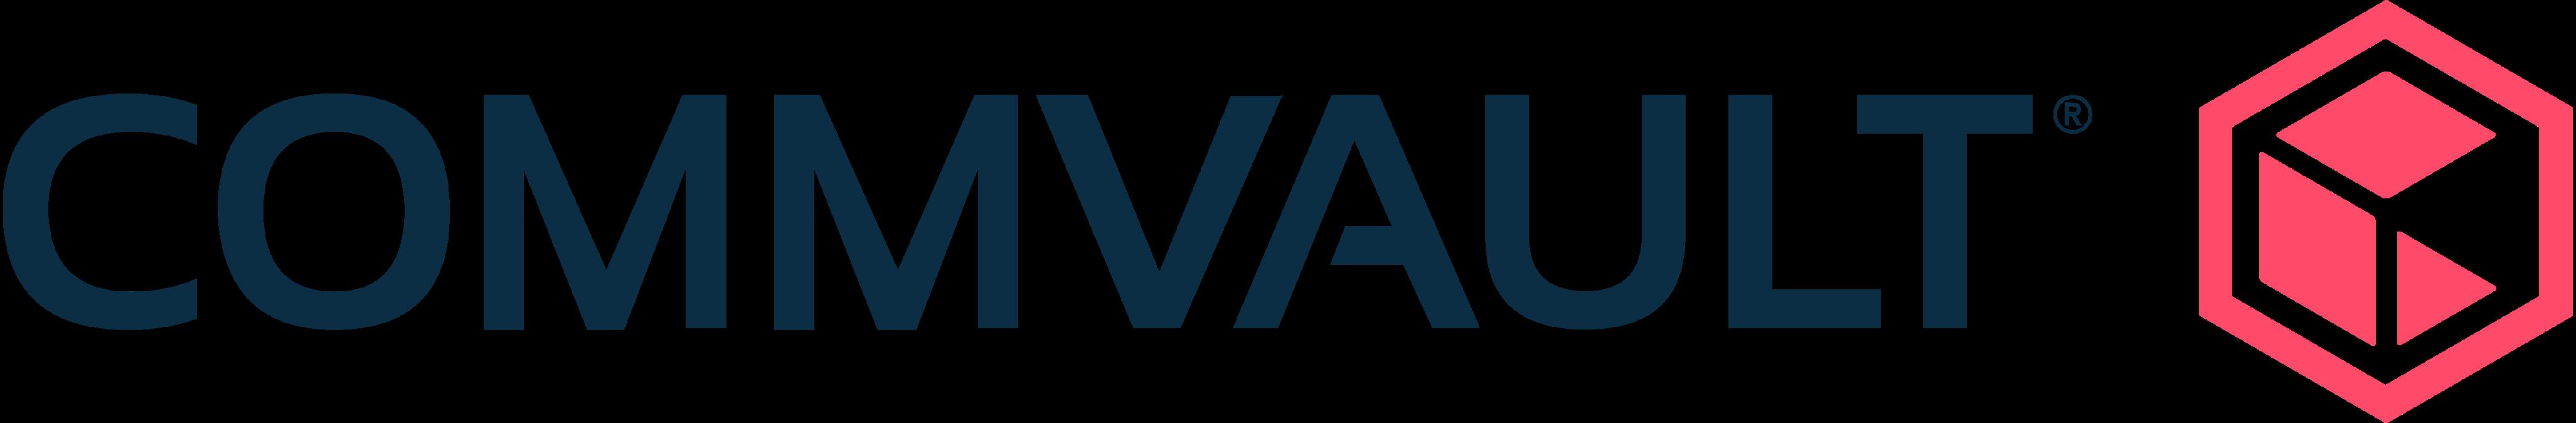 commvault-eu Logo